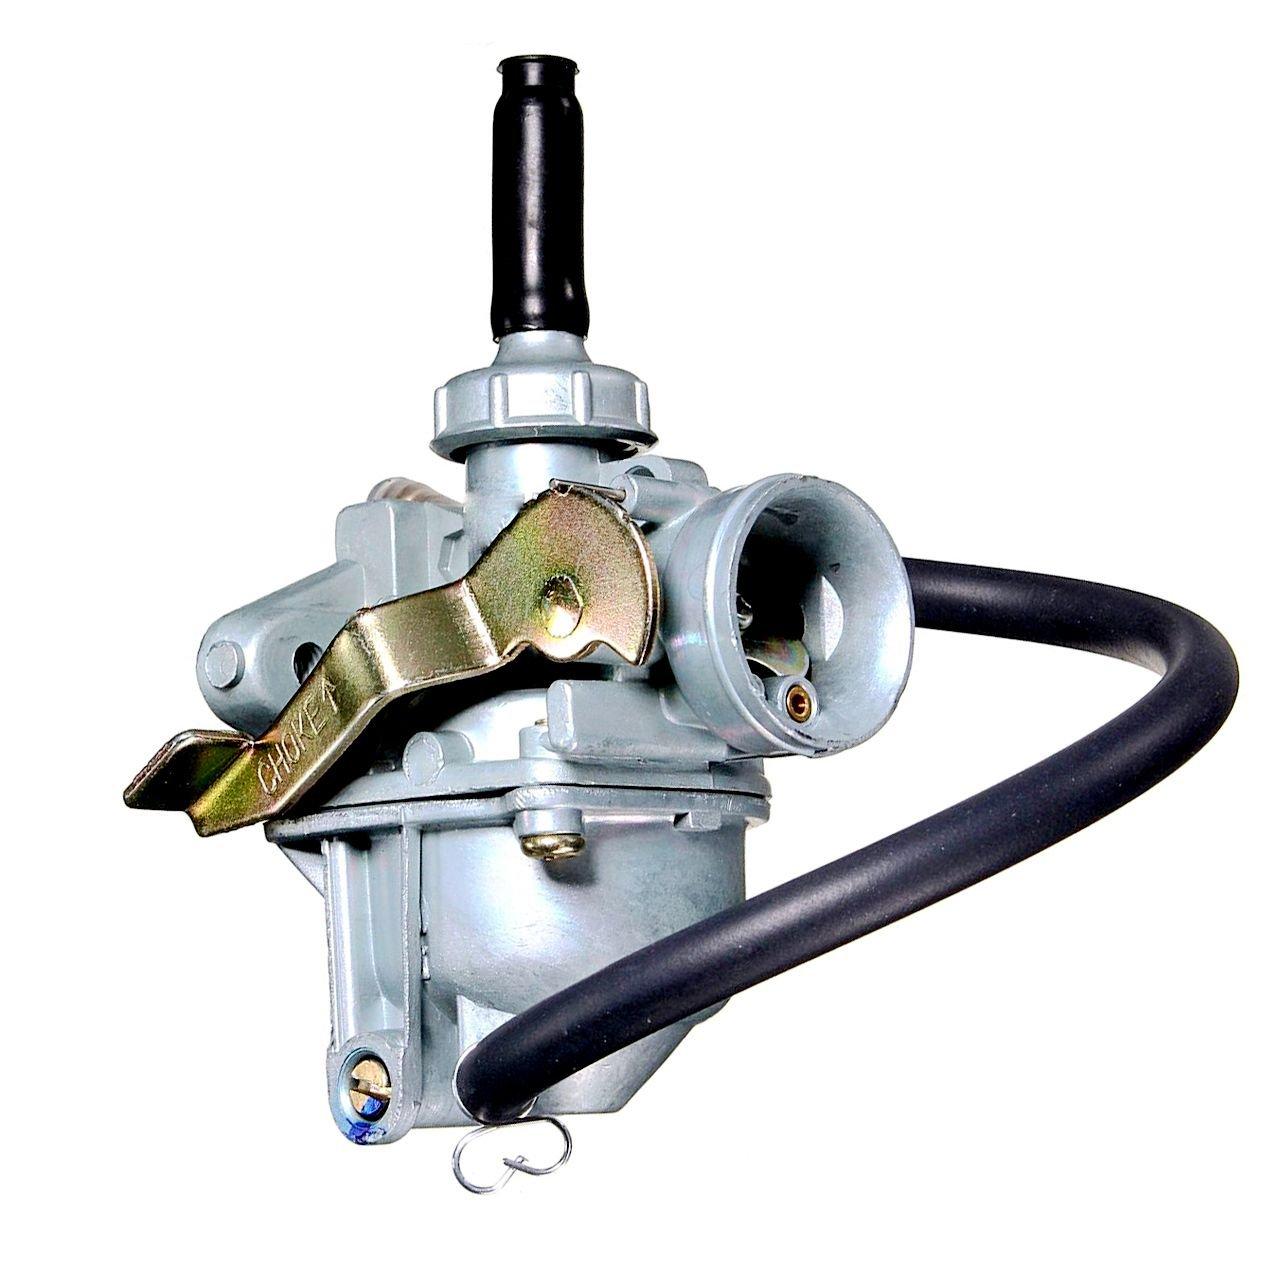 New CRF50 Carburetor For Honda Crf50 Xr50 Z50 Crf Xr 50 Z50R 2004-2009 Stock Carb by FYIYI